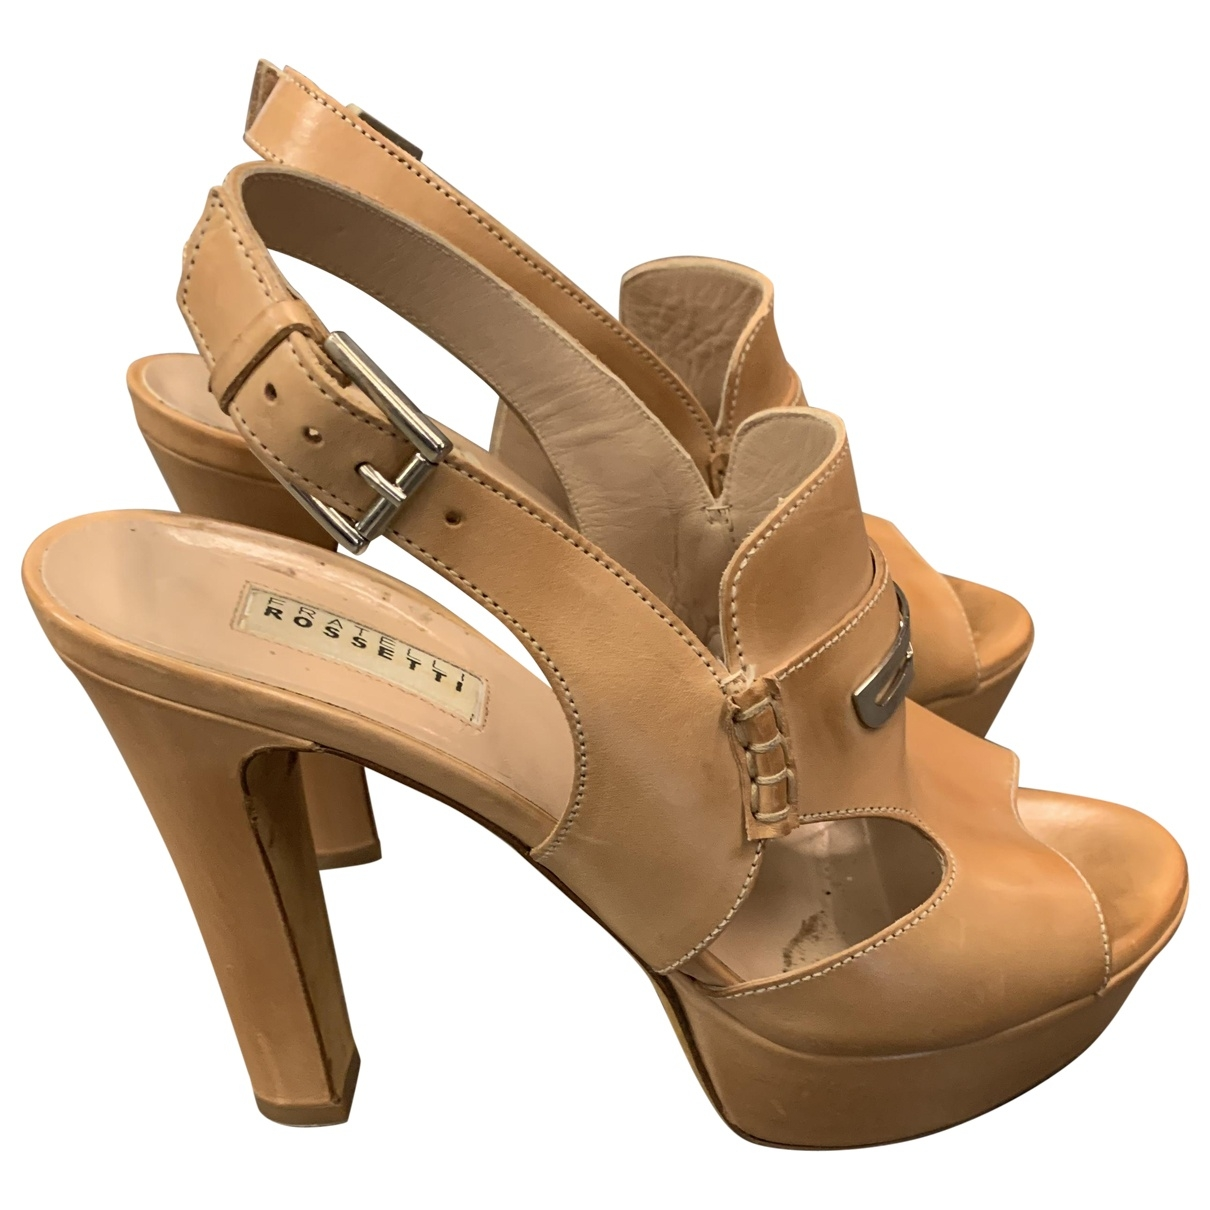 Fratelli Rossetti - Sandales   pour femme en cuir - camel